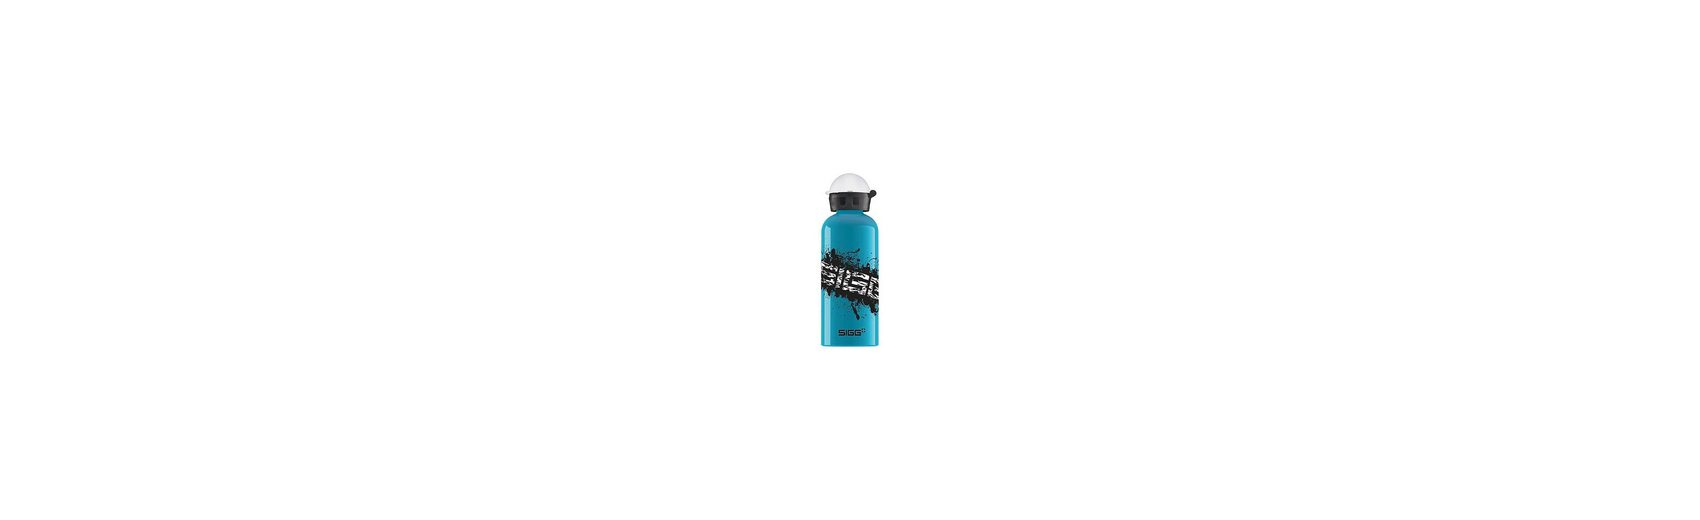 SIGG Alu-Trinkflasche Splash Aqua, 600 ml